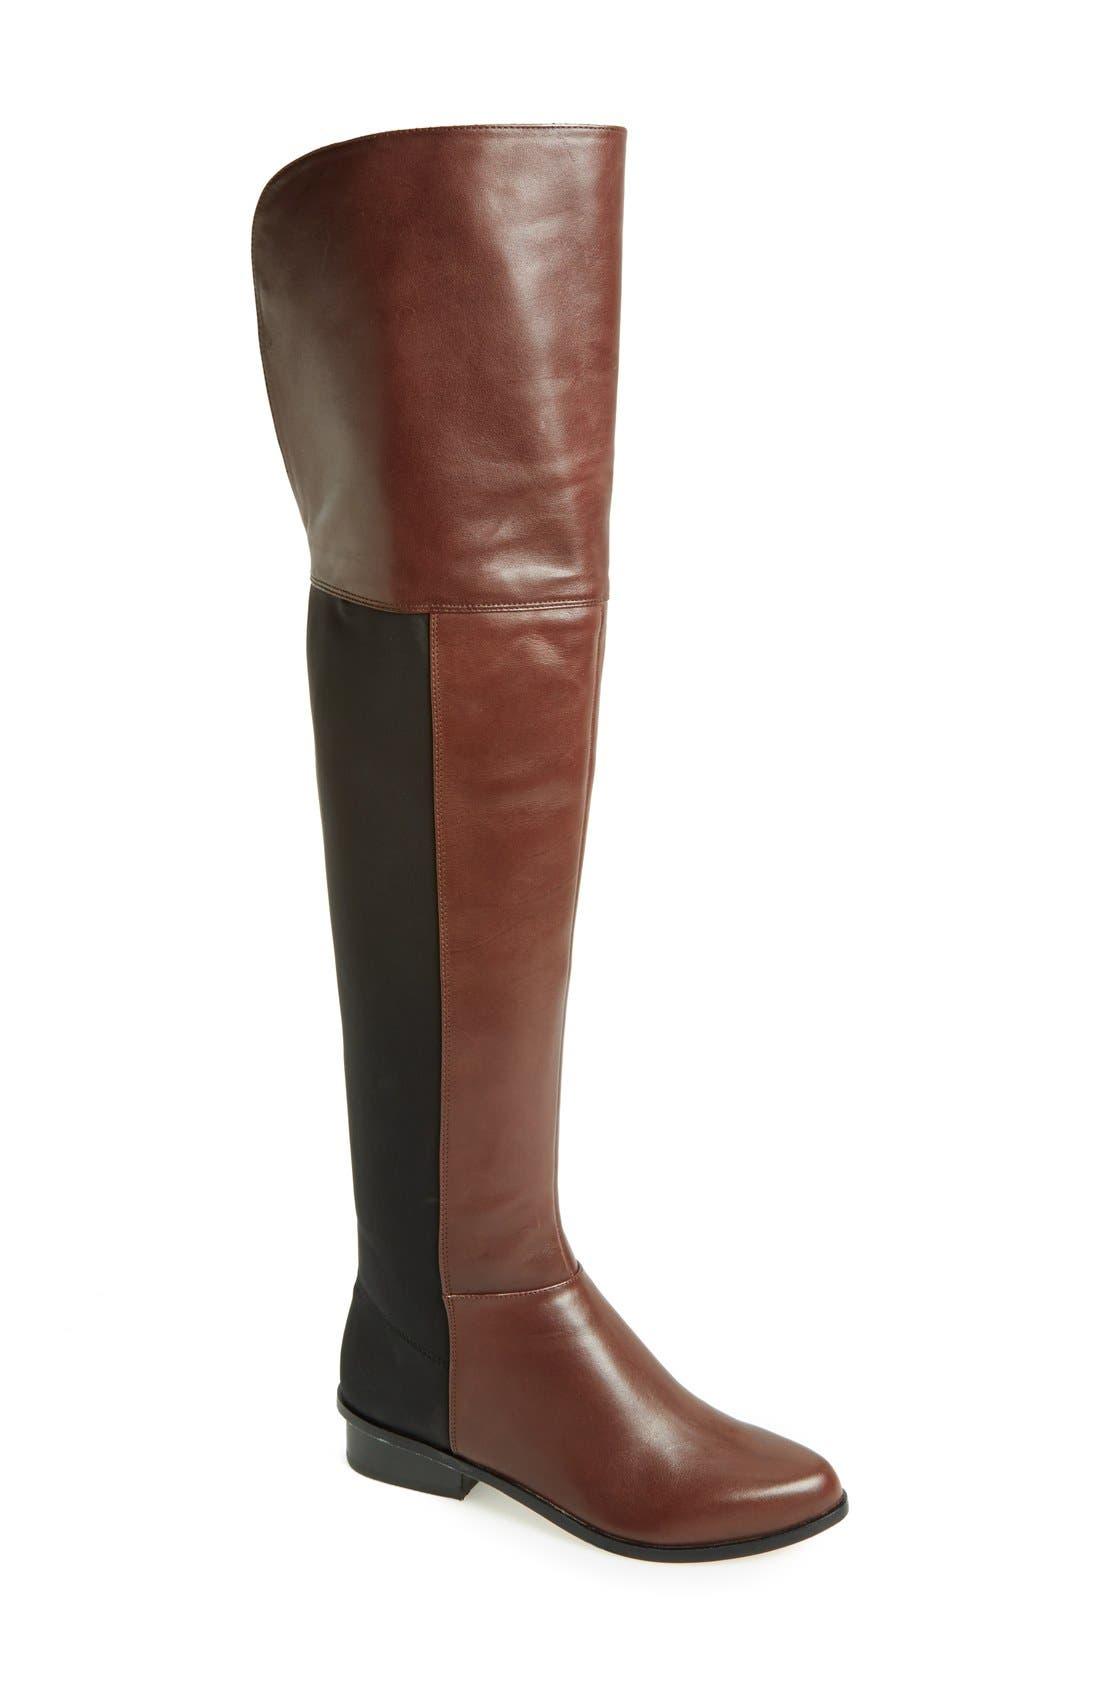 Alternate Image 1 Selected - BCBGMAXAZRIA 'Slink' Over the Knee Boot (Women)